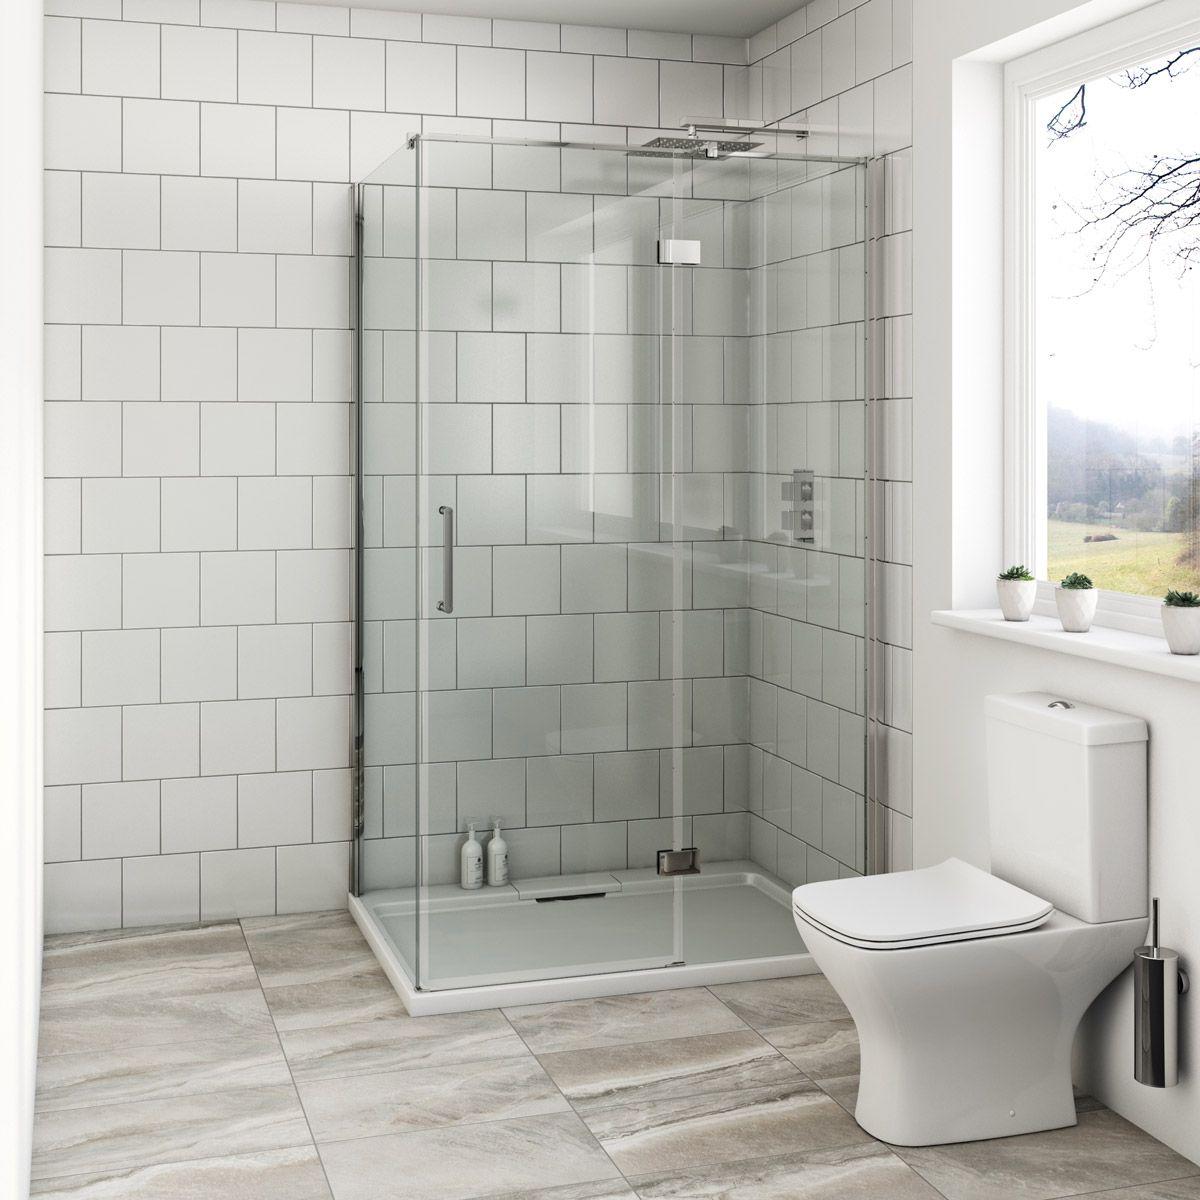 Mode Beck premium 8mm hinged easy clean rectangular shower enclosure ...